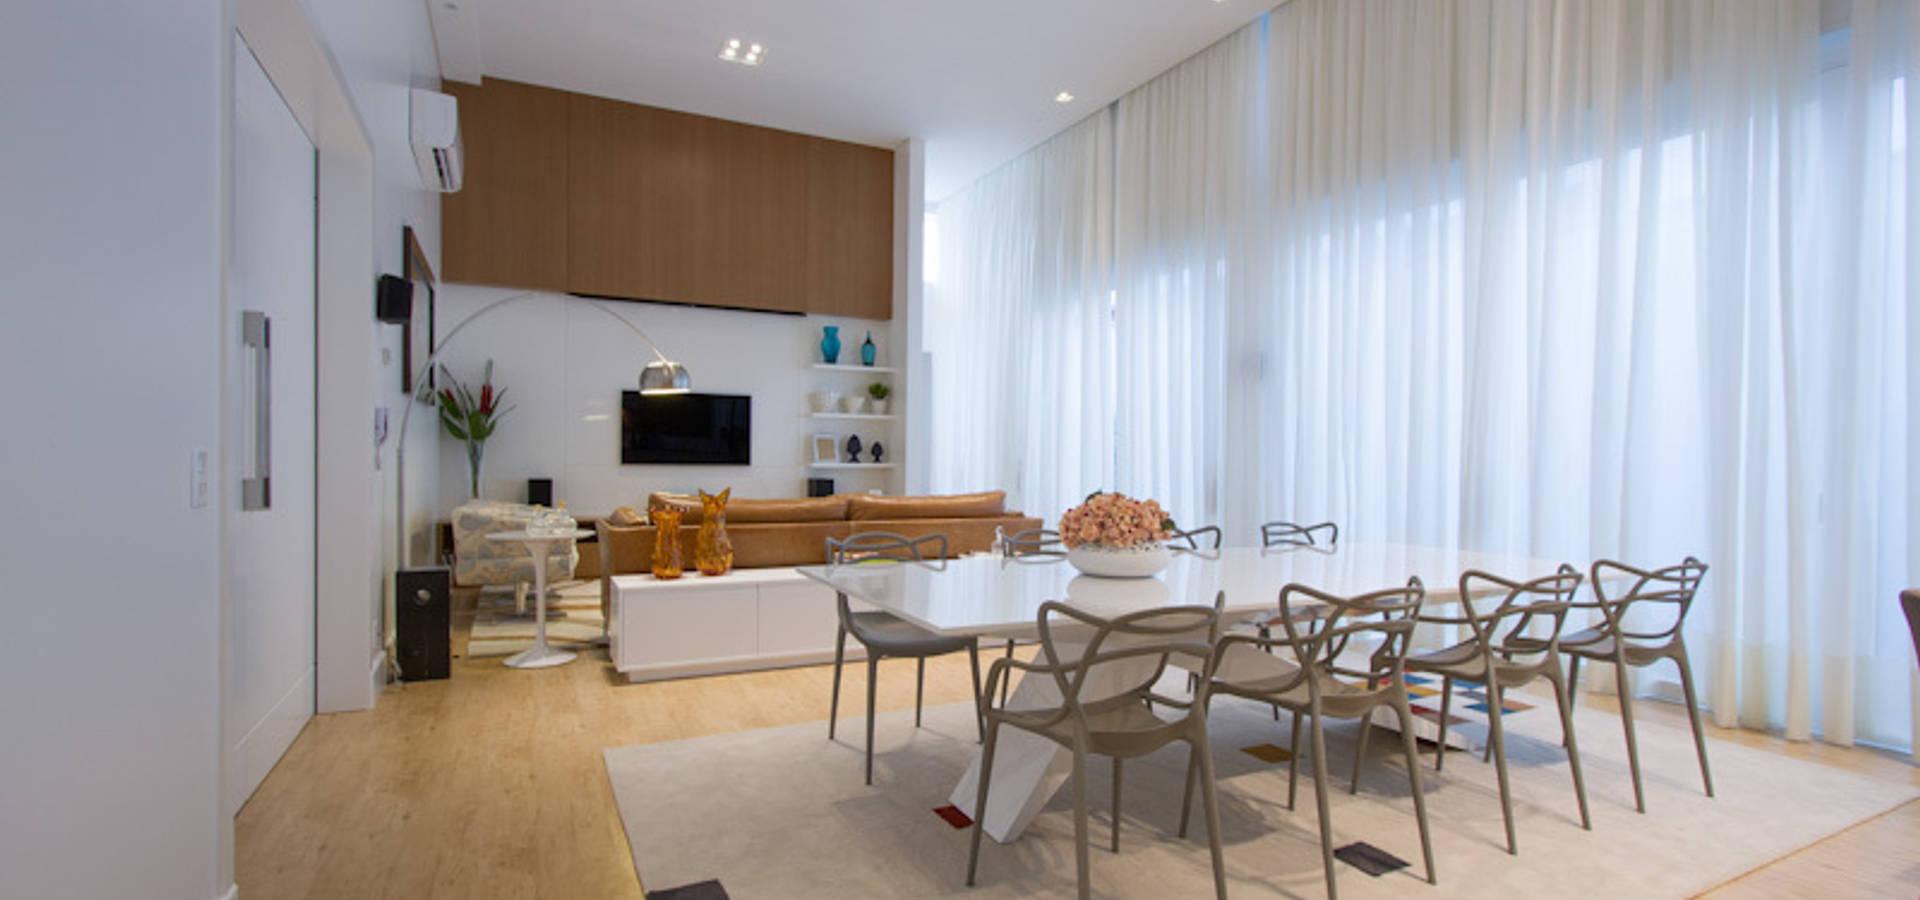 Estúdio Kza Arquitetura e Interiores